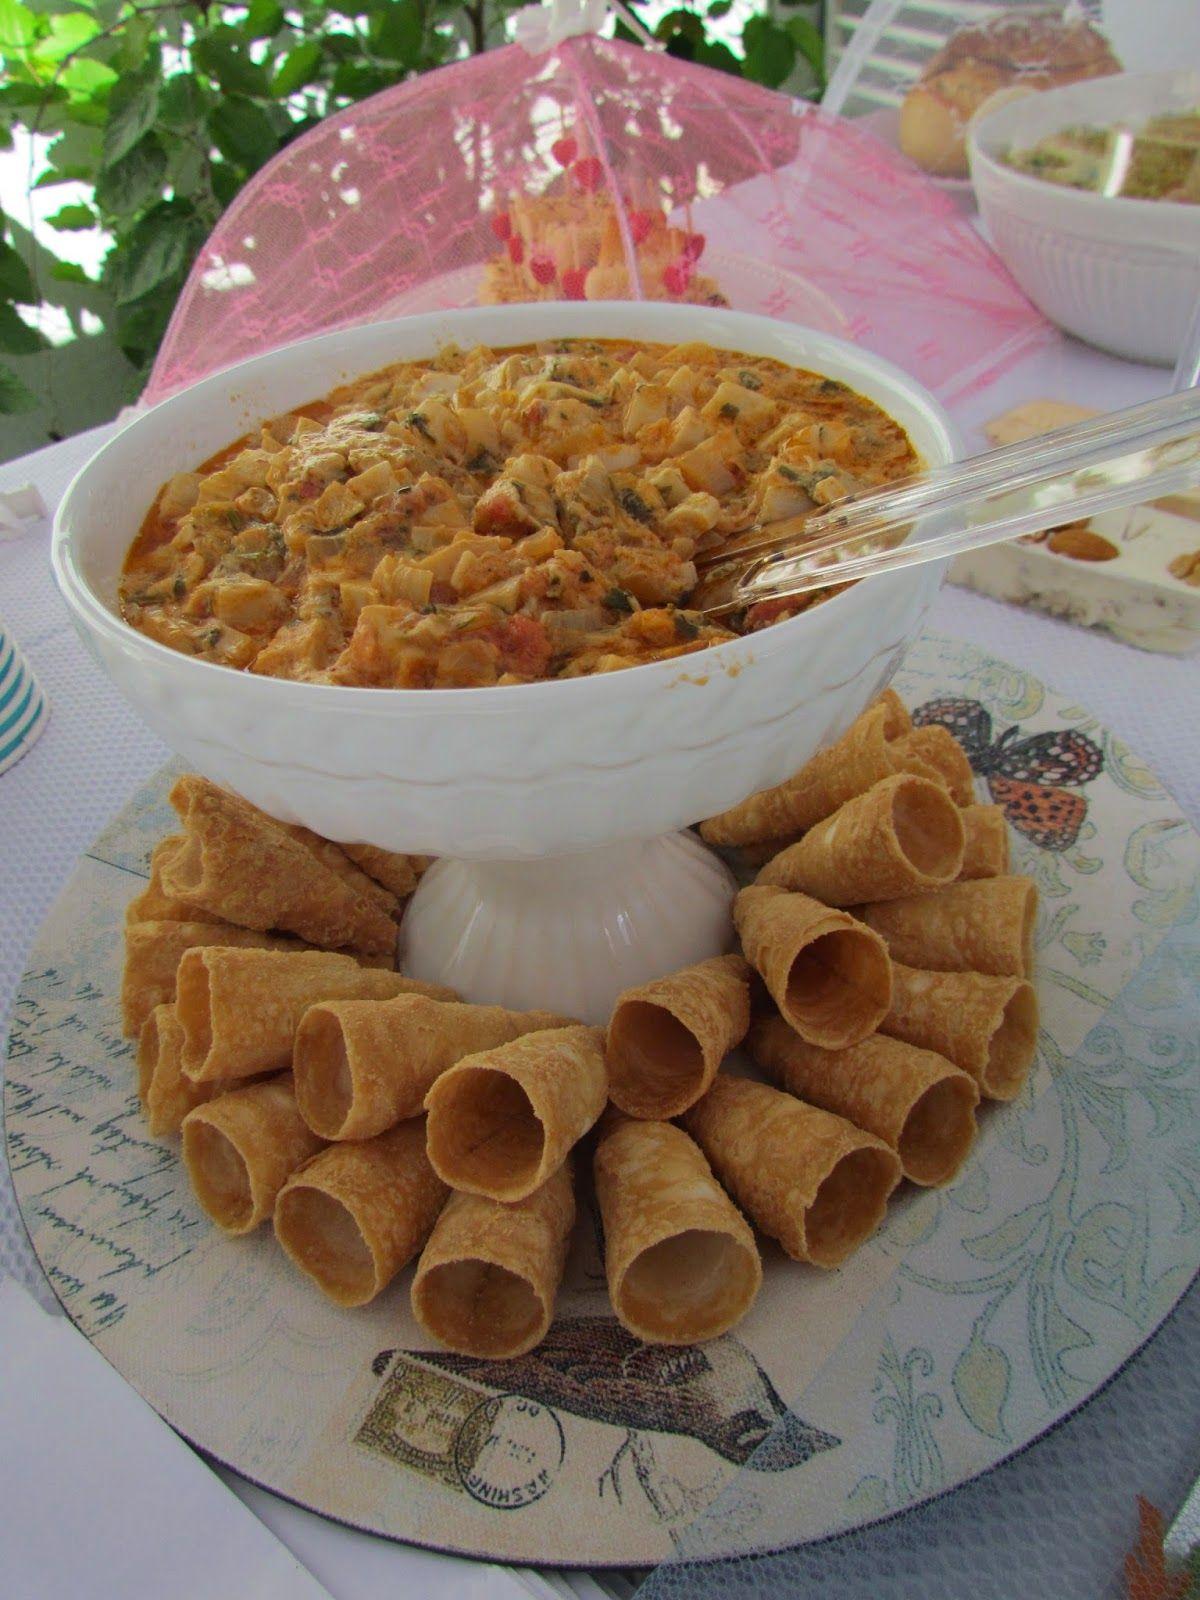 Festa cinderela da valentina cinderella party for for Servir comida